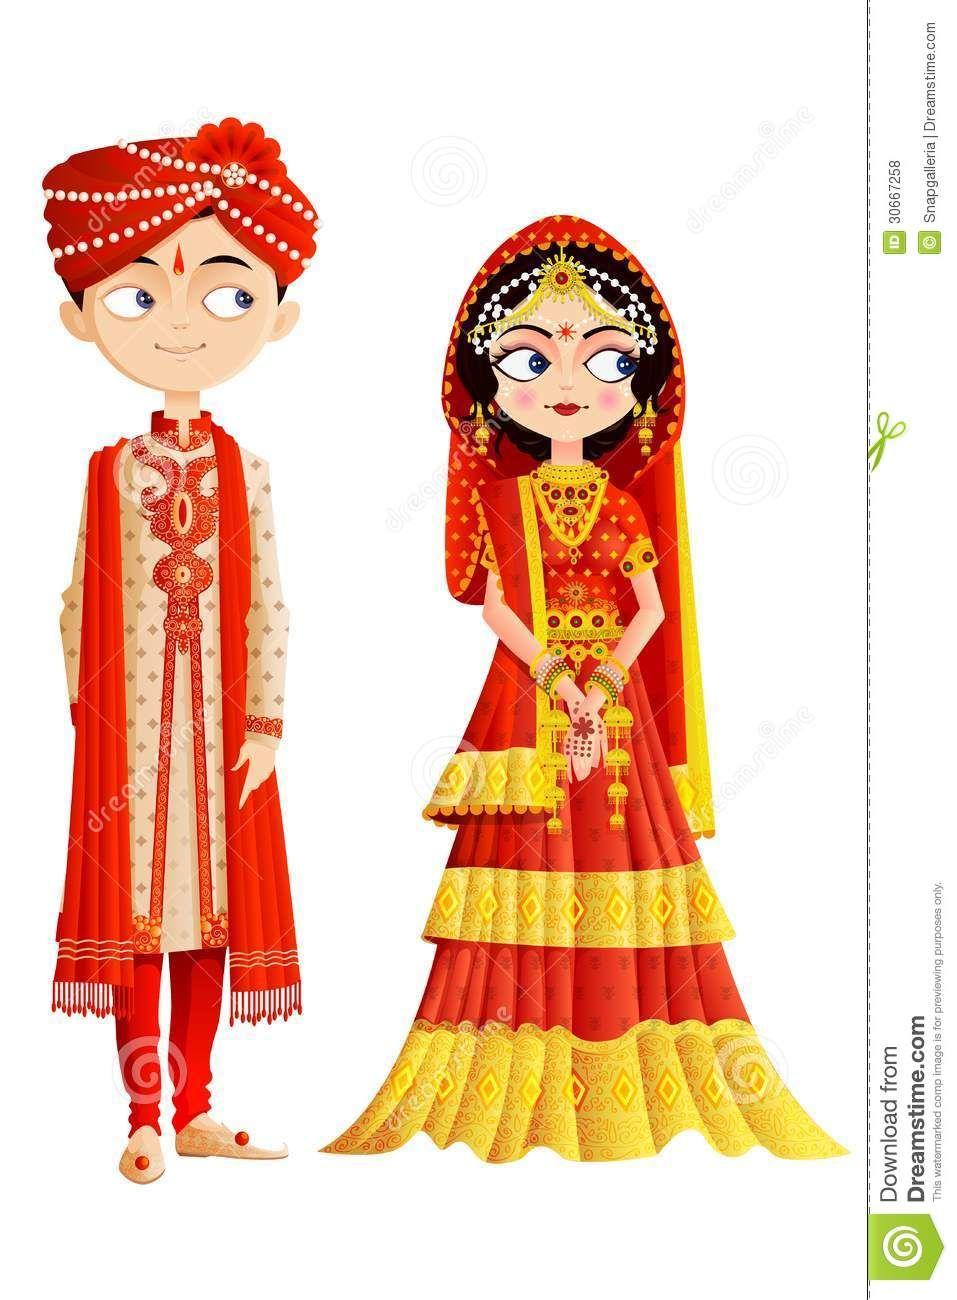 Indian Wedding Couple - | drawing | Pinterest | Wedding couples ...